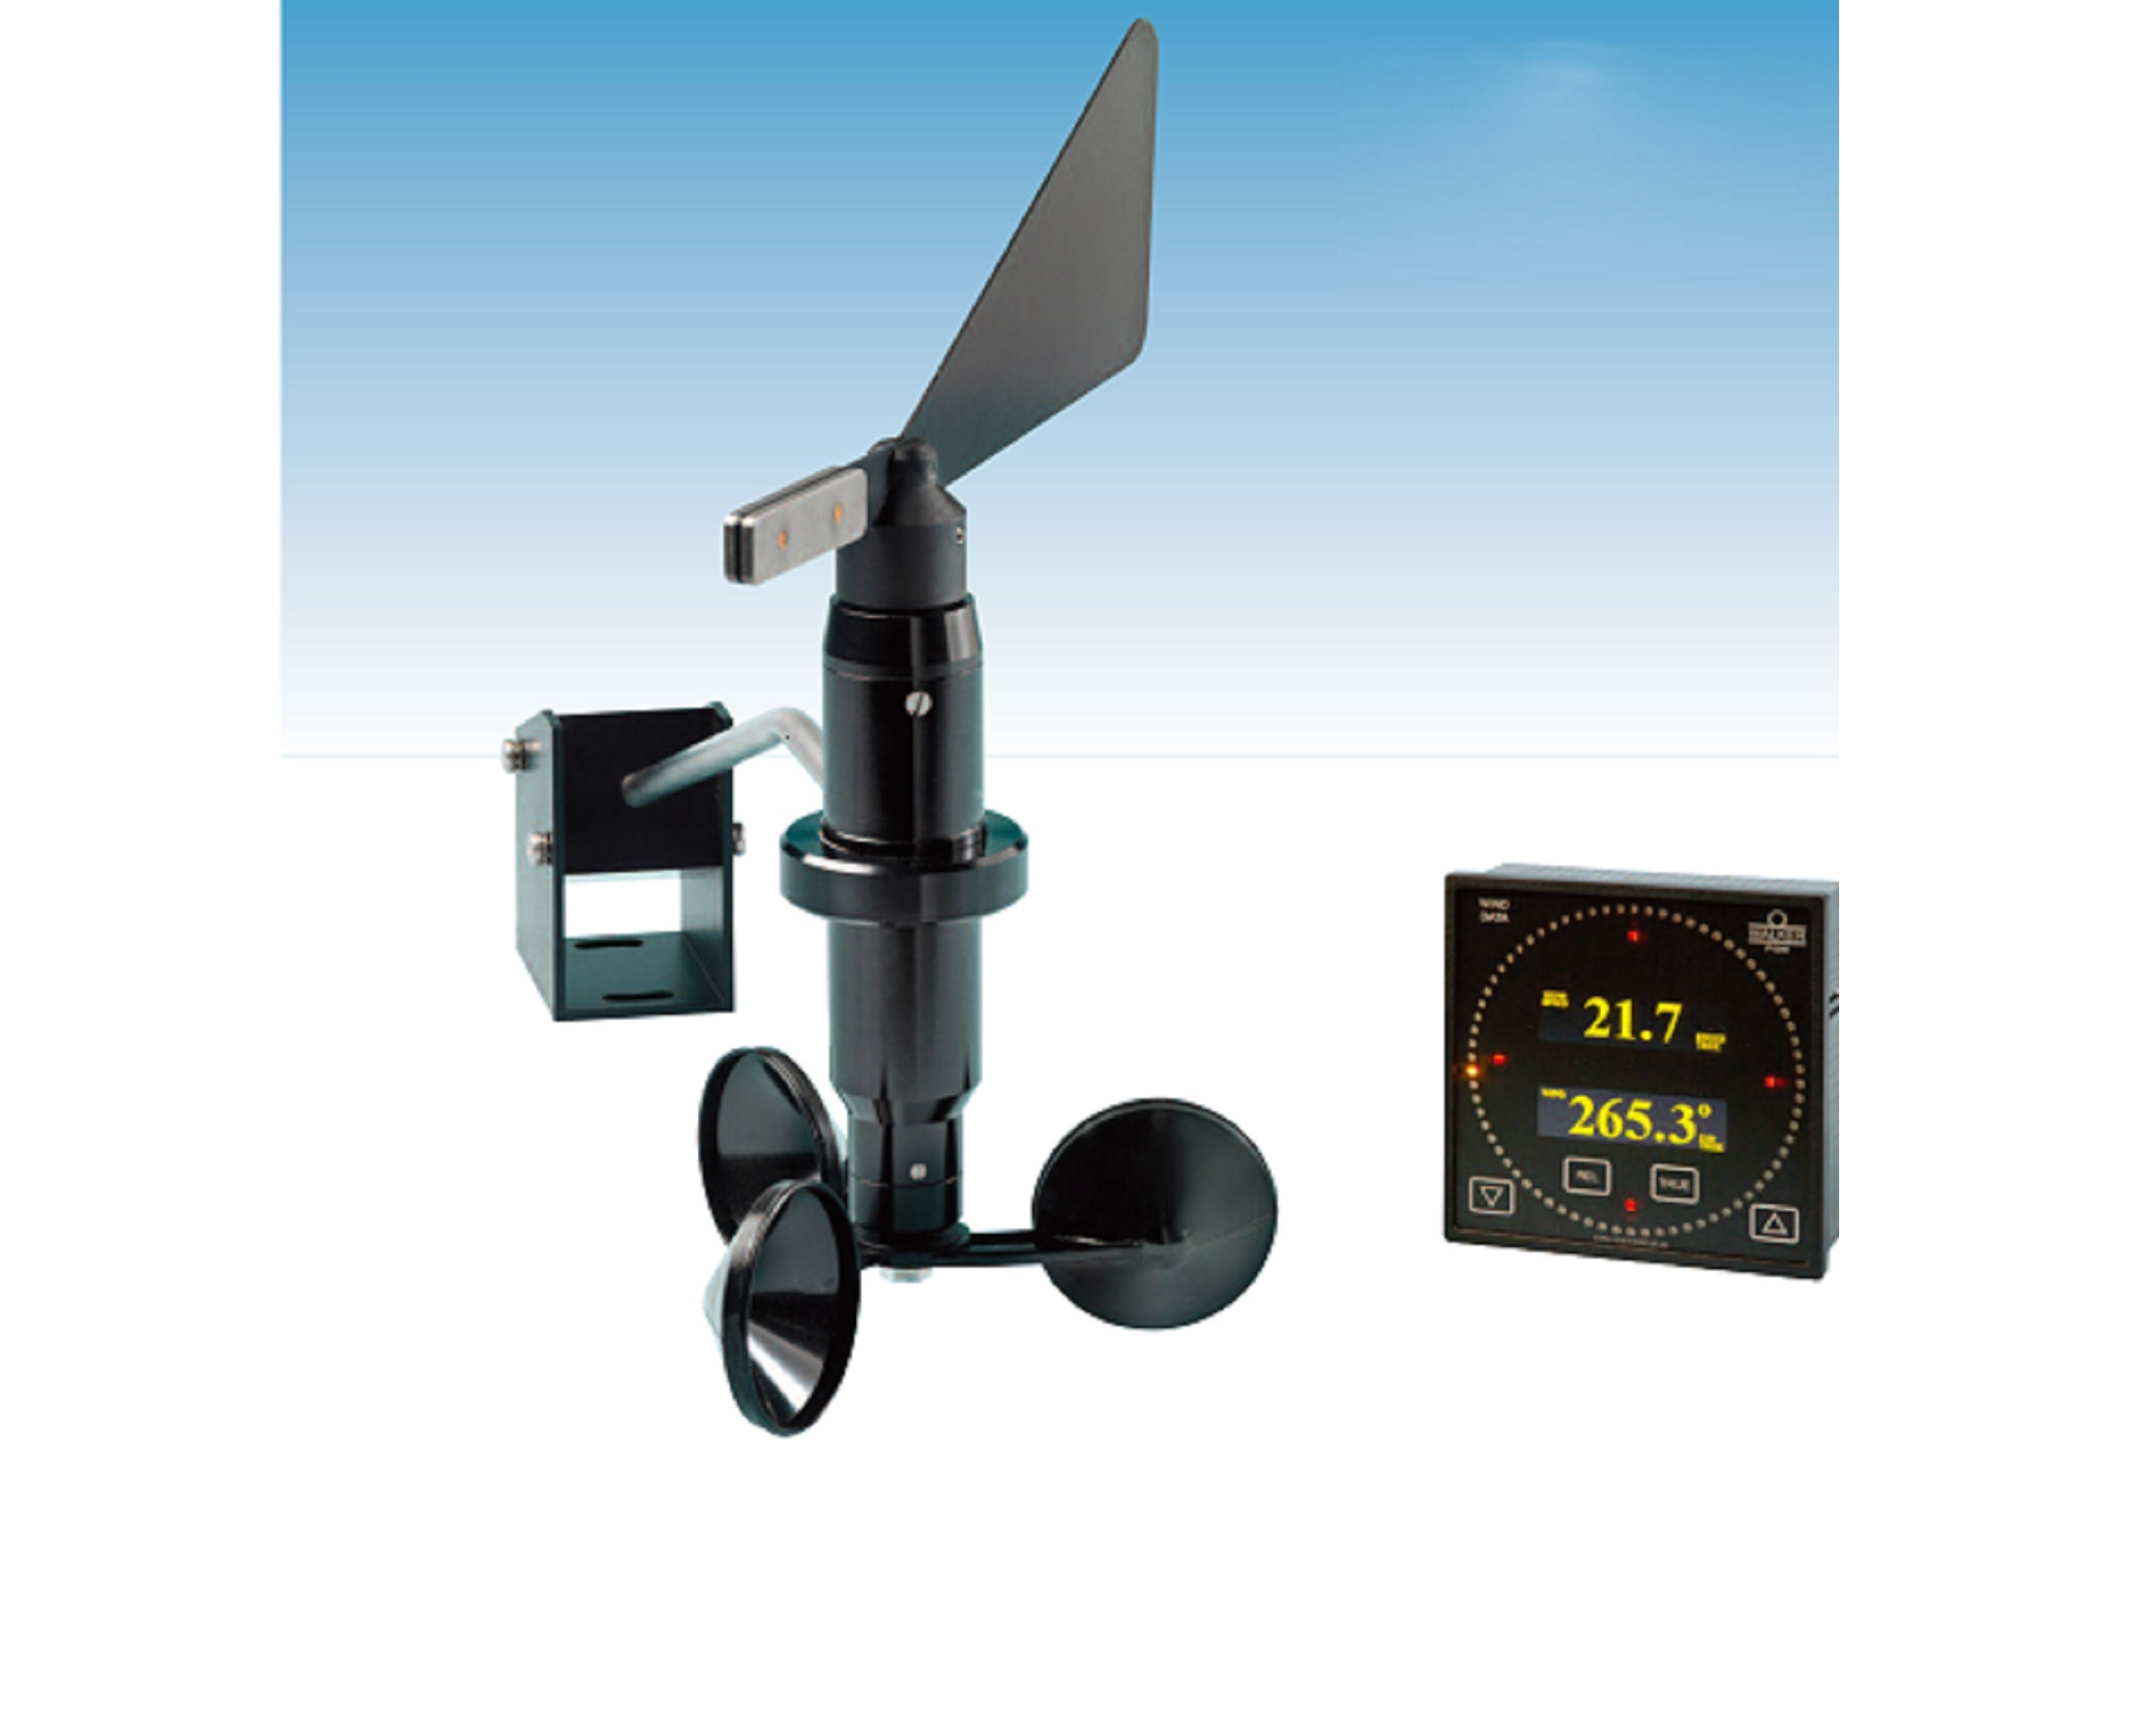 wind speed &direction 2050MK2 - Marcomtrade